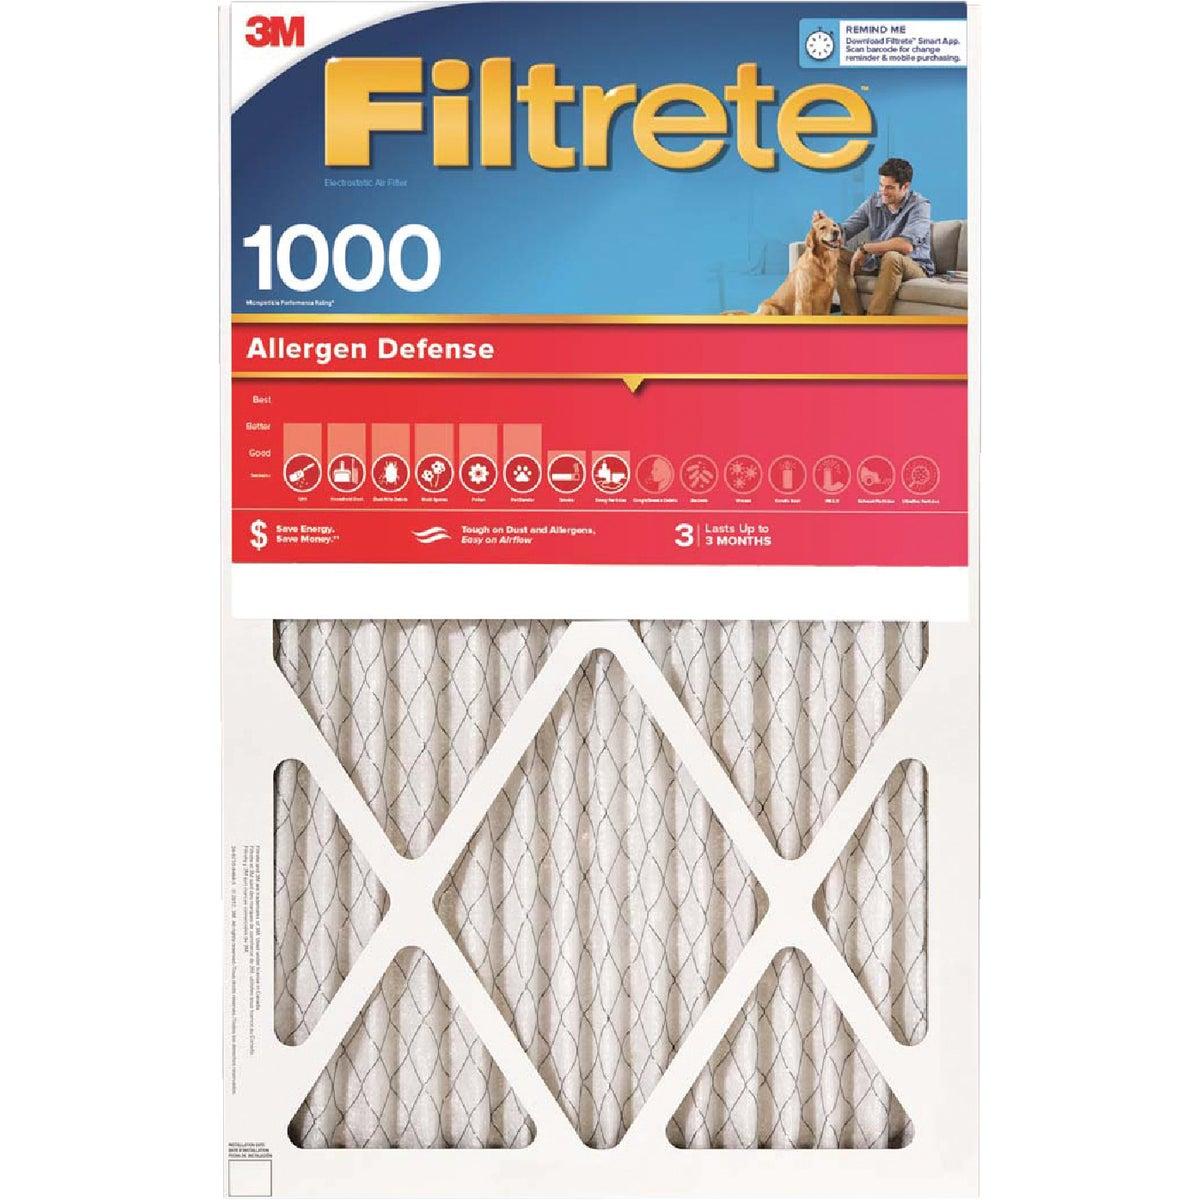 3M Filtrete 20 In. x 30 In. x 1 In. Allergen Defense 1000/1085 MPR Furnace Filter